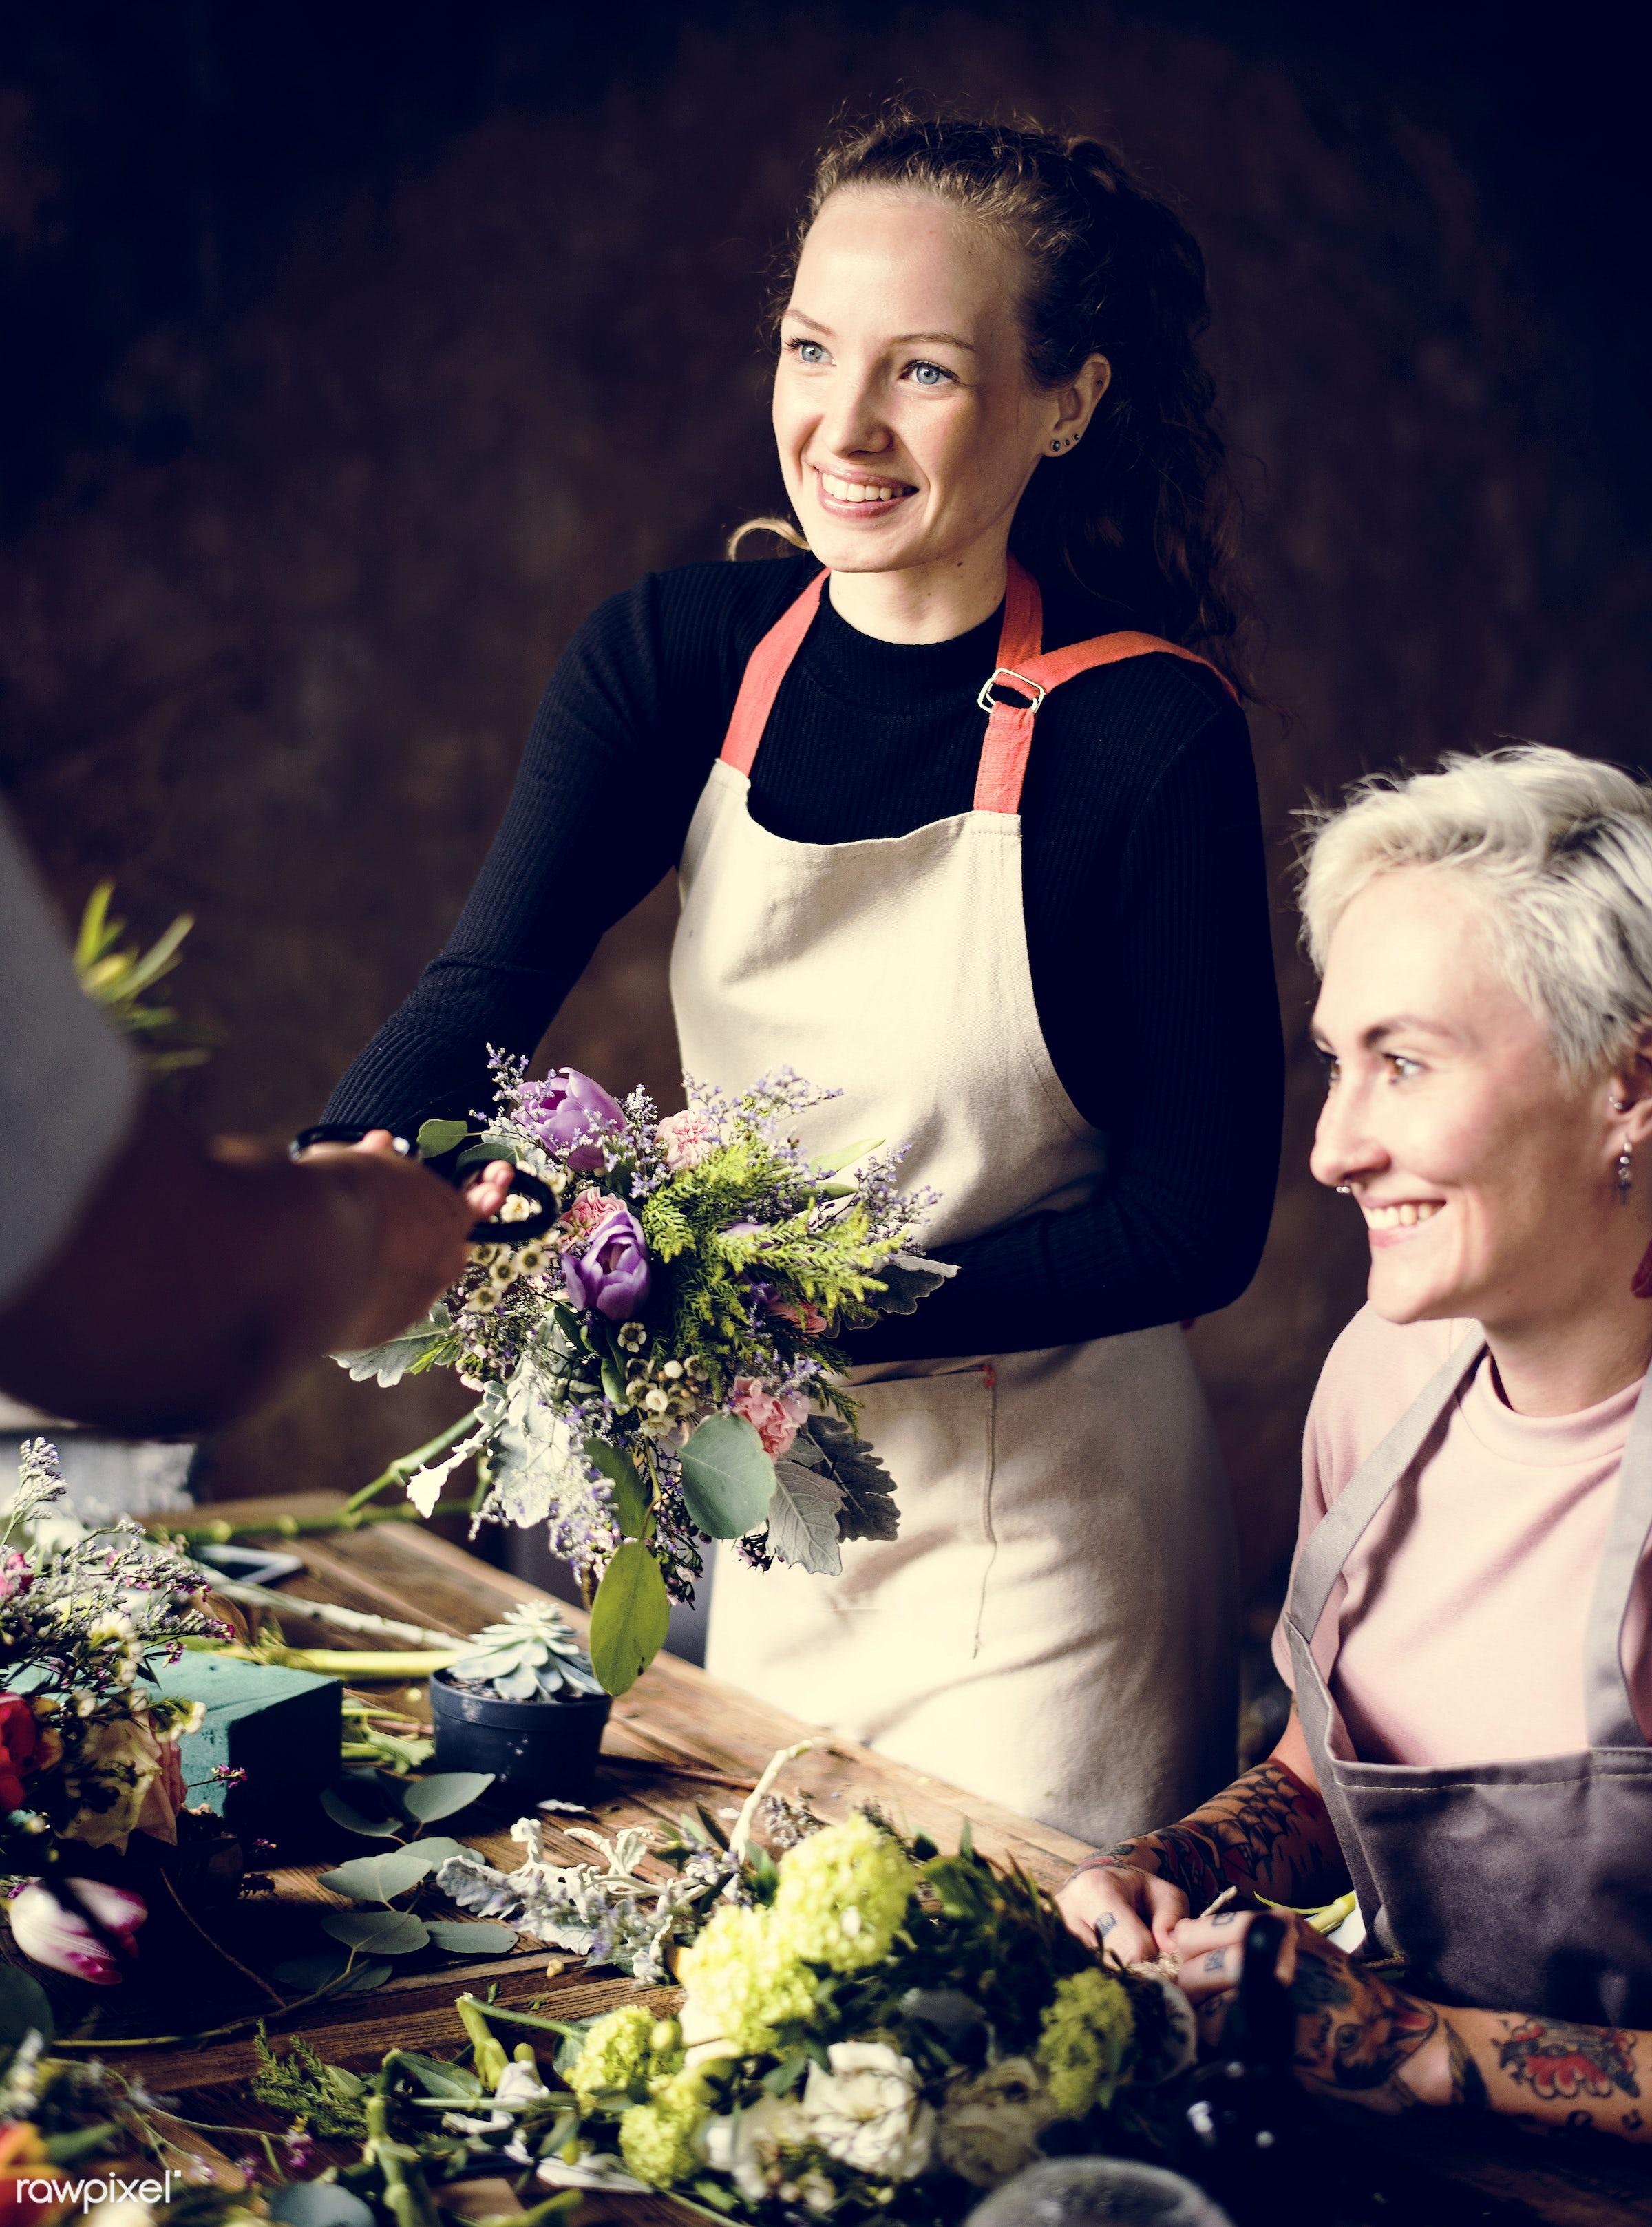 shop, bouquet, detail, person, people, decor, nature, flowers, work, hold, refreshment, career, florist, present,...